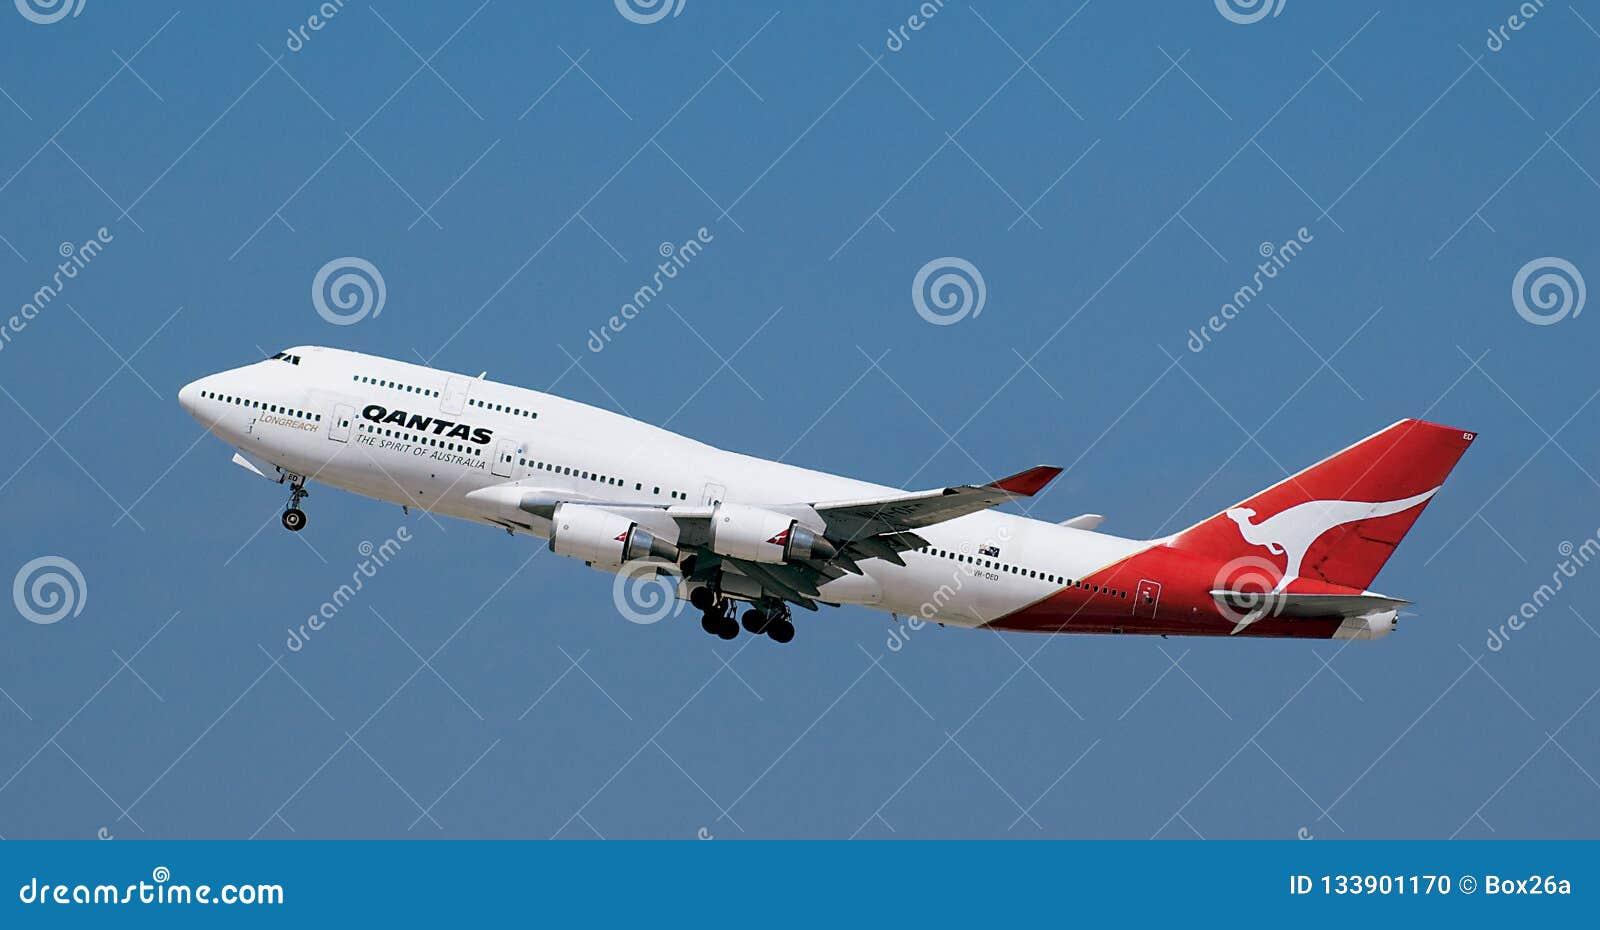 Qantas Boeing 747 jumbo jet Zdejmować